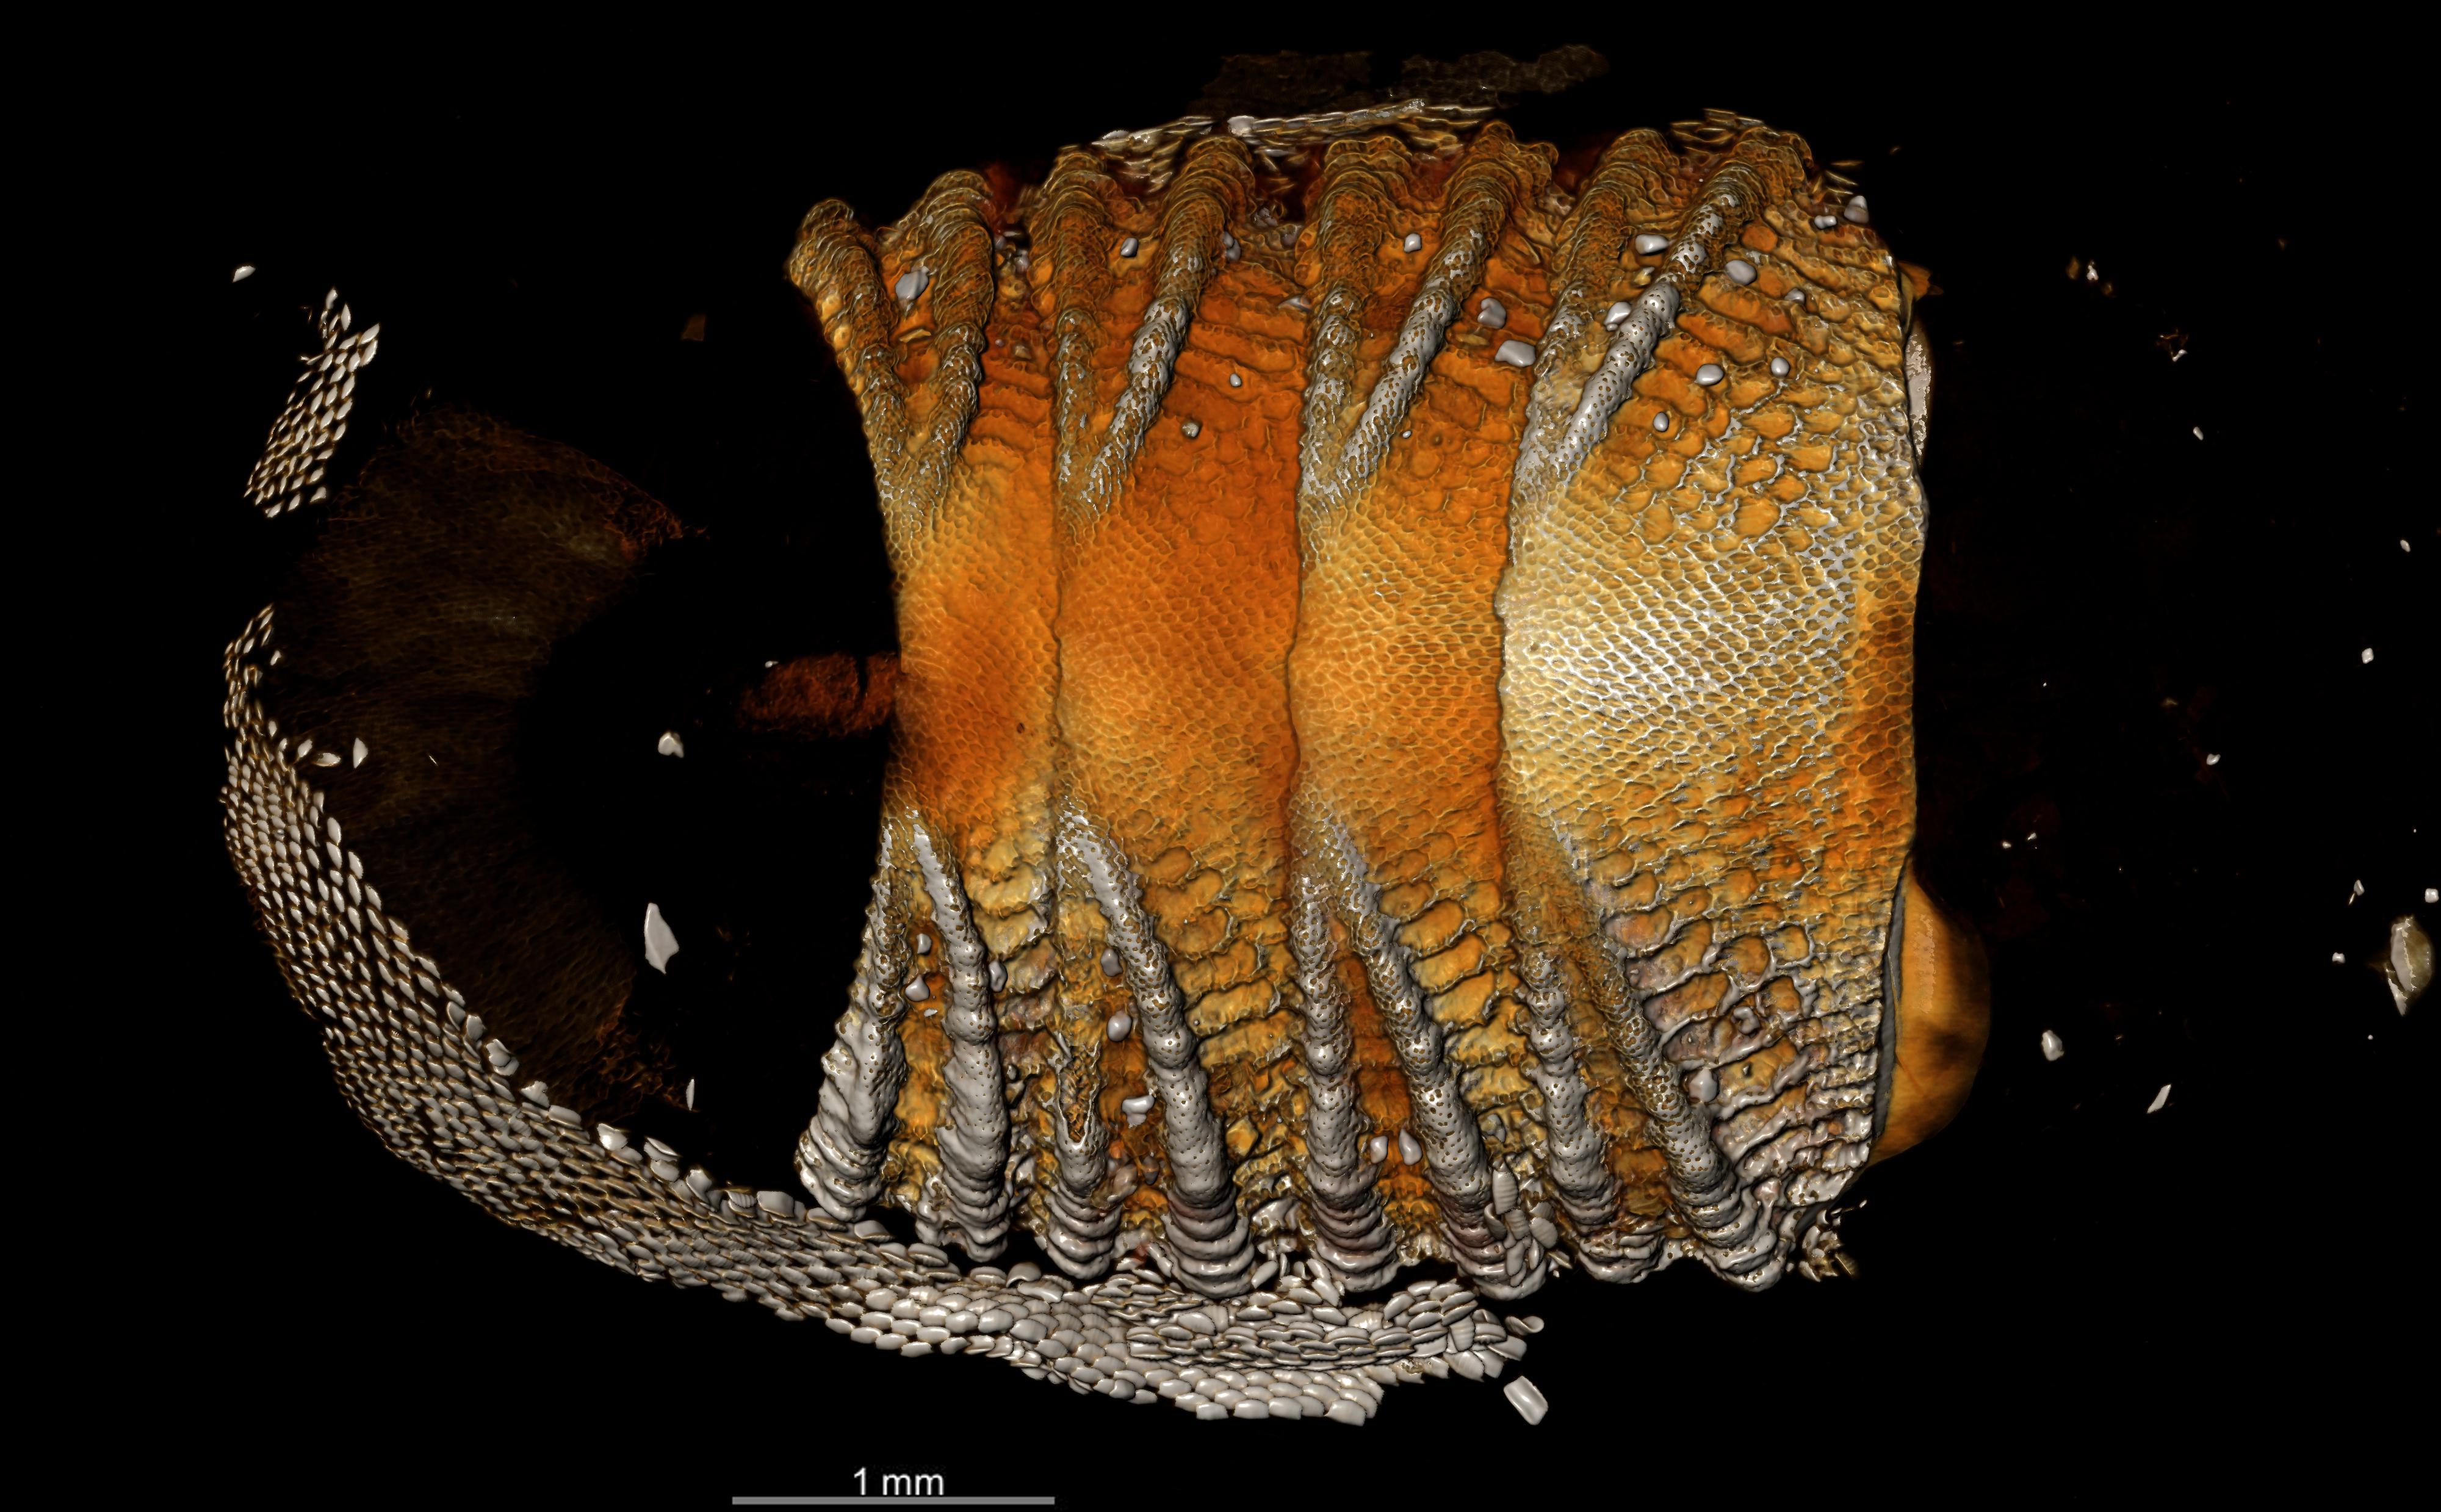 BE-RBINS-INV HOLOTYPE MT.3742/1 Callistochiton belliatus MICROCT XRE DORSAL.jpg